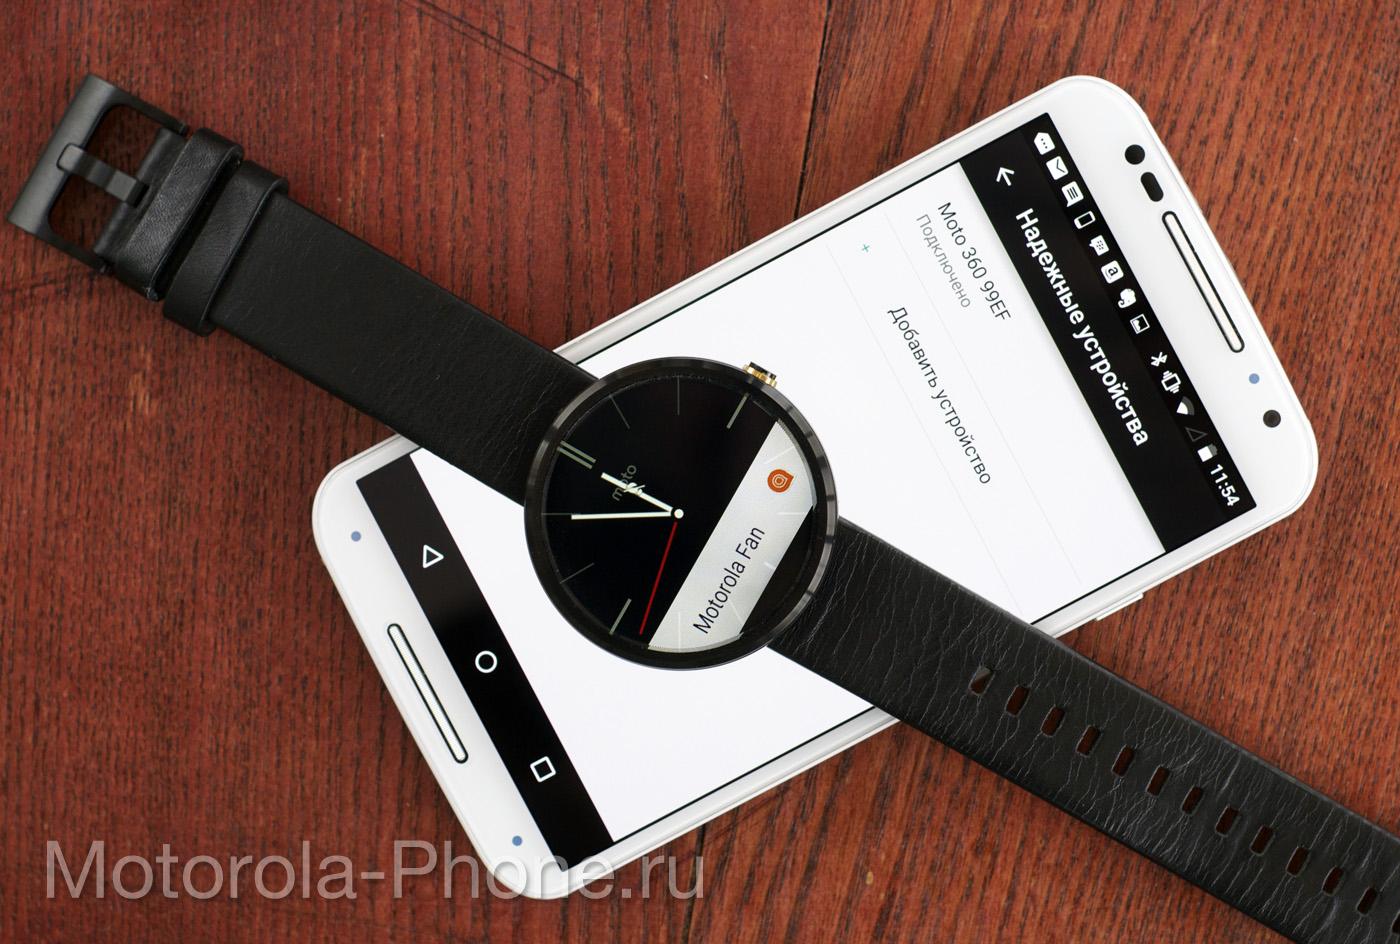 Motorola-Moto-X-07